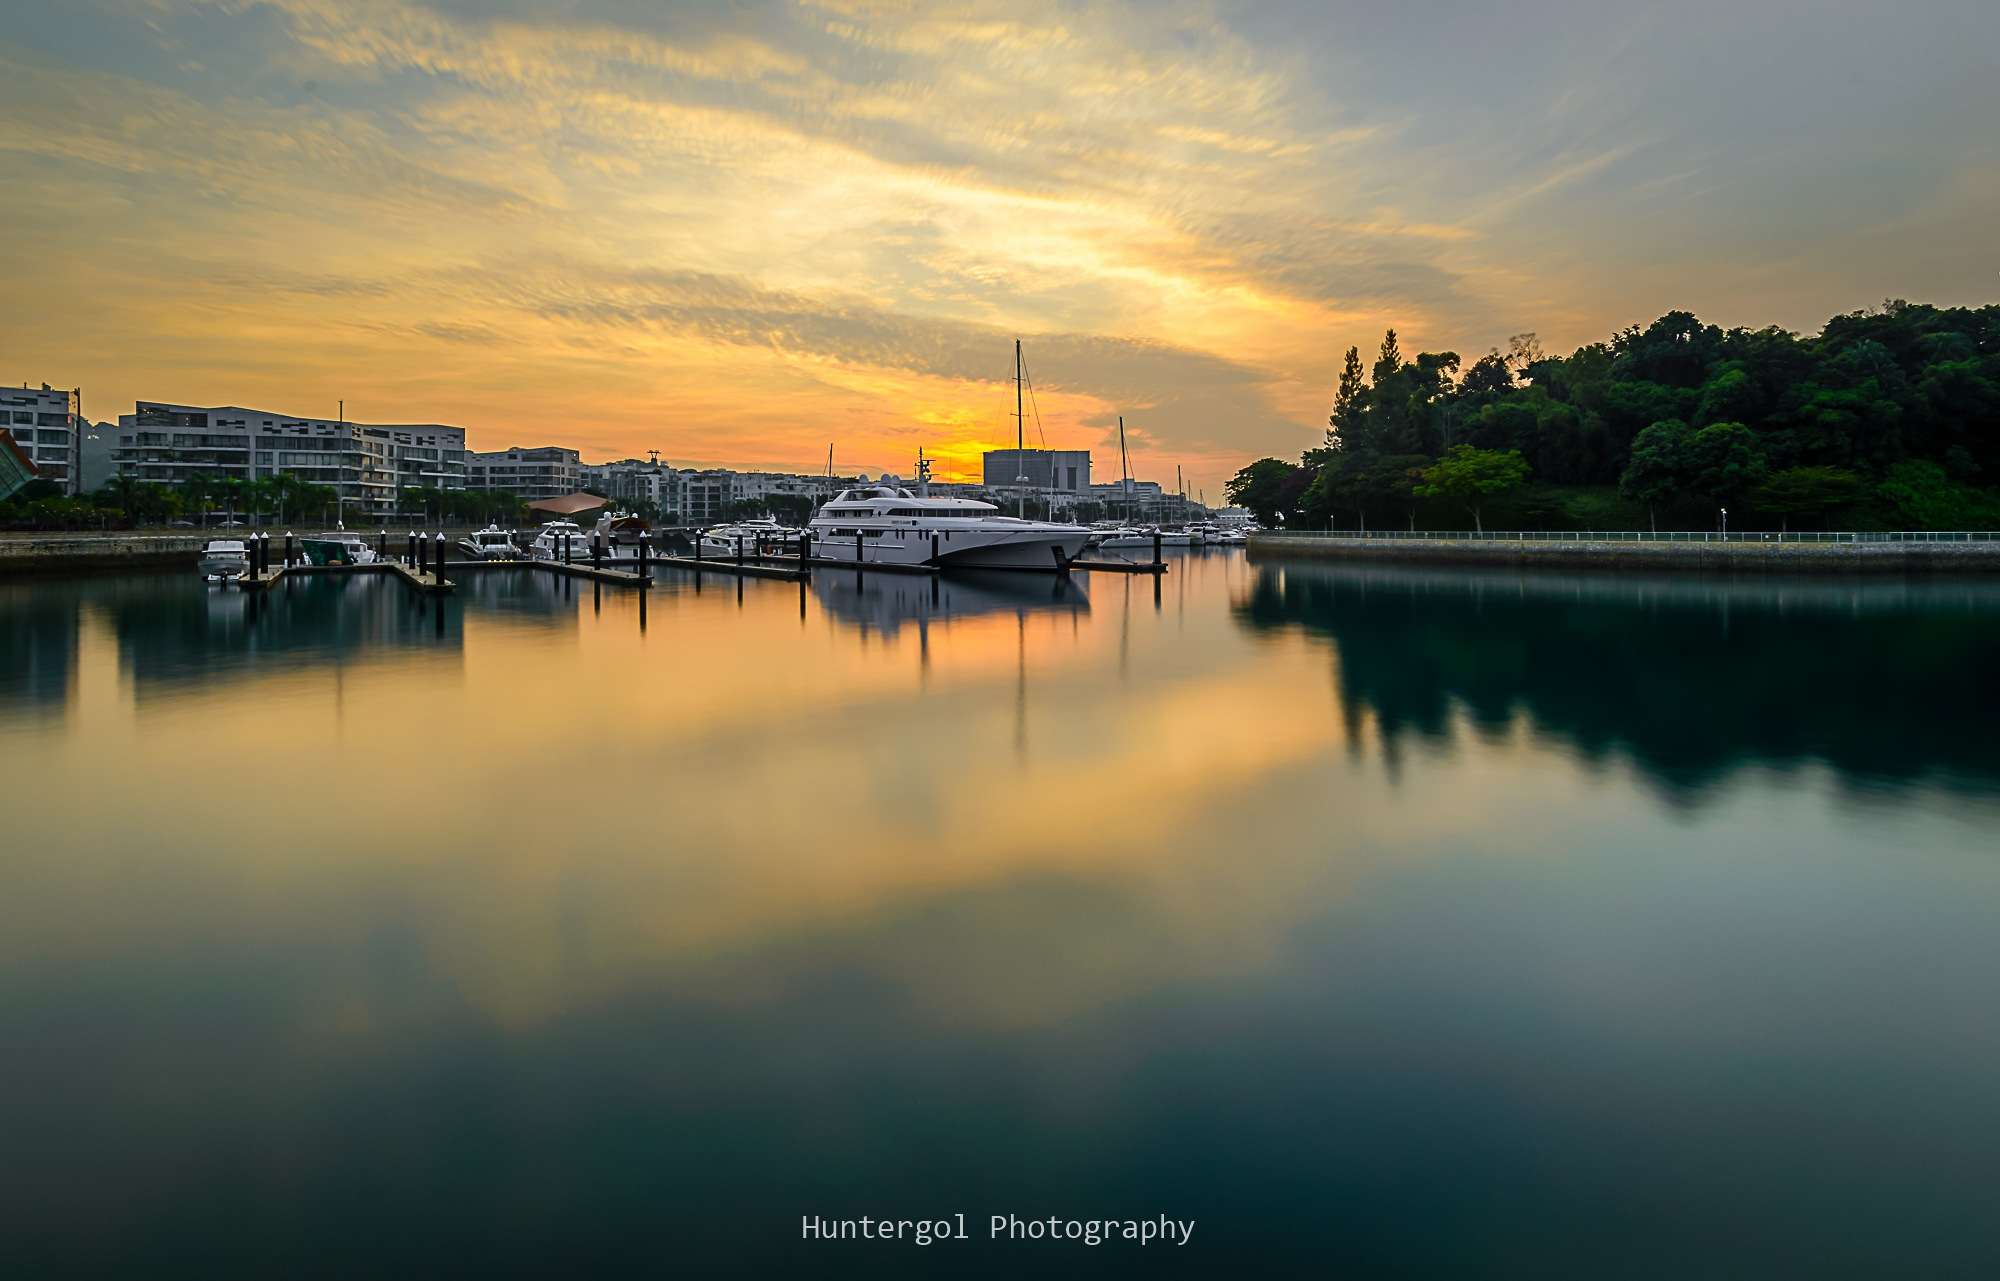 Dawn at Keppel bay by huntergol_photography